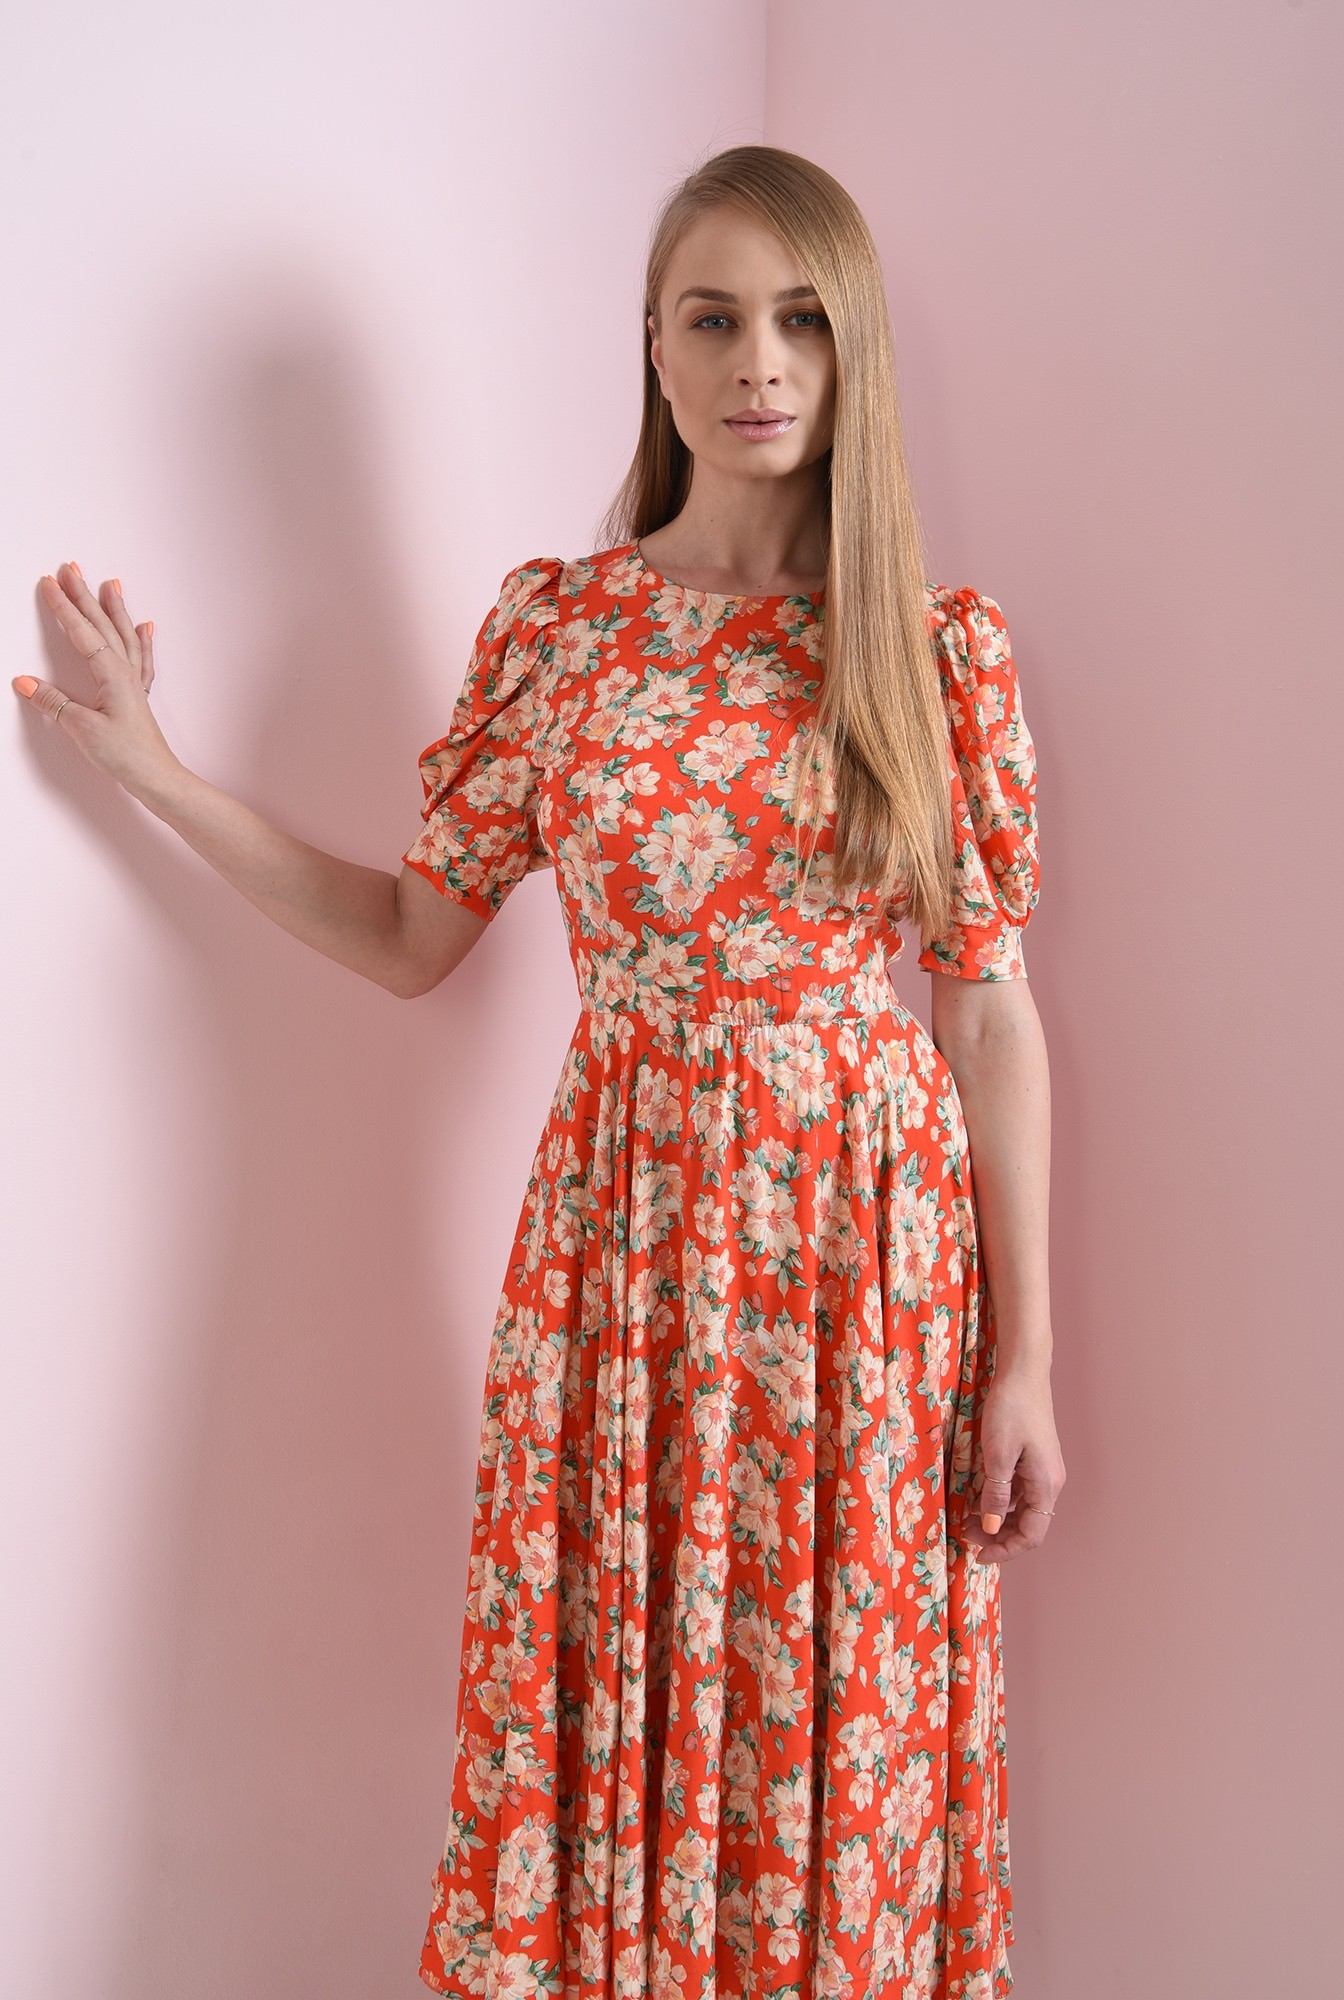 2 - rochie rosie, cu flori, evazata, Poema